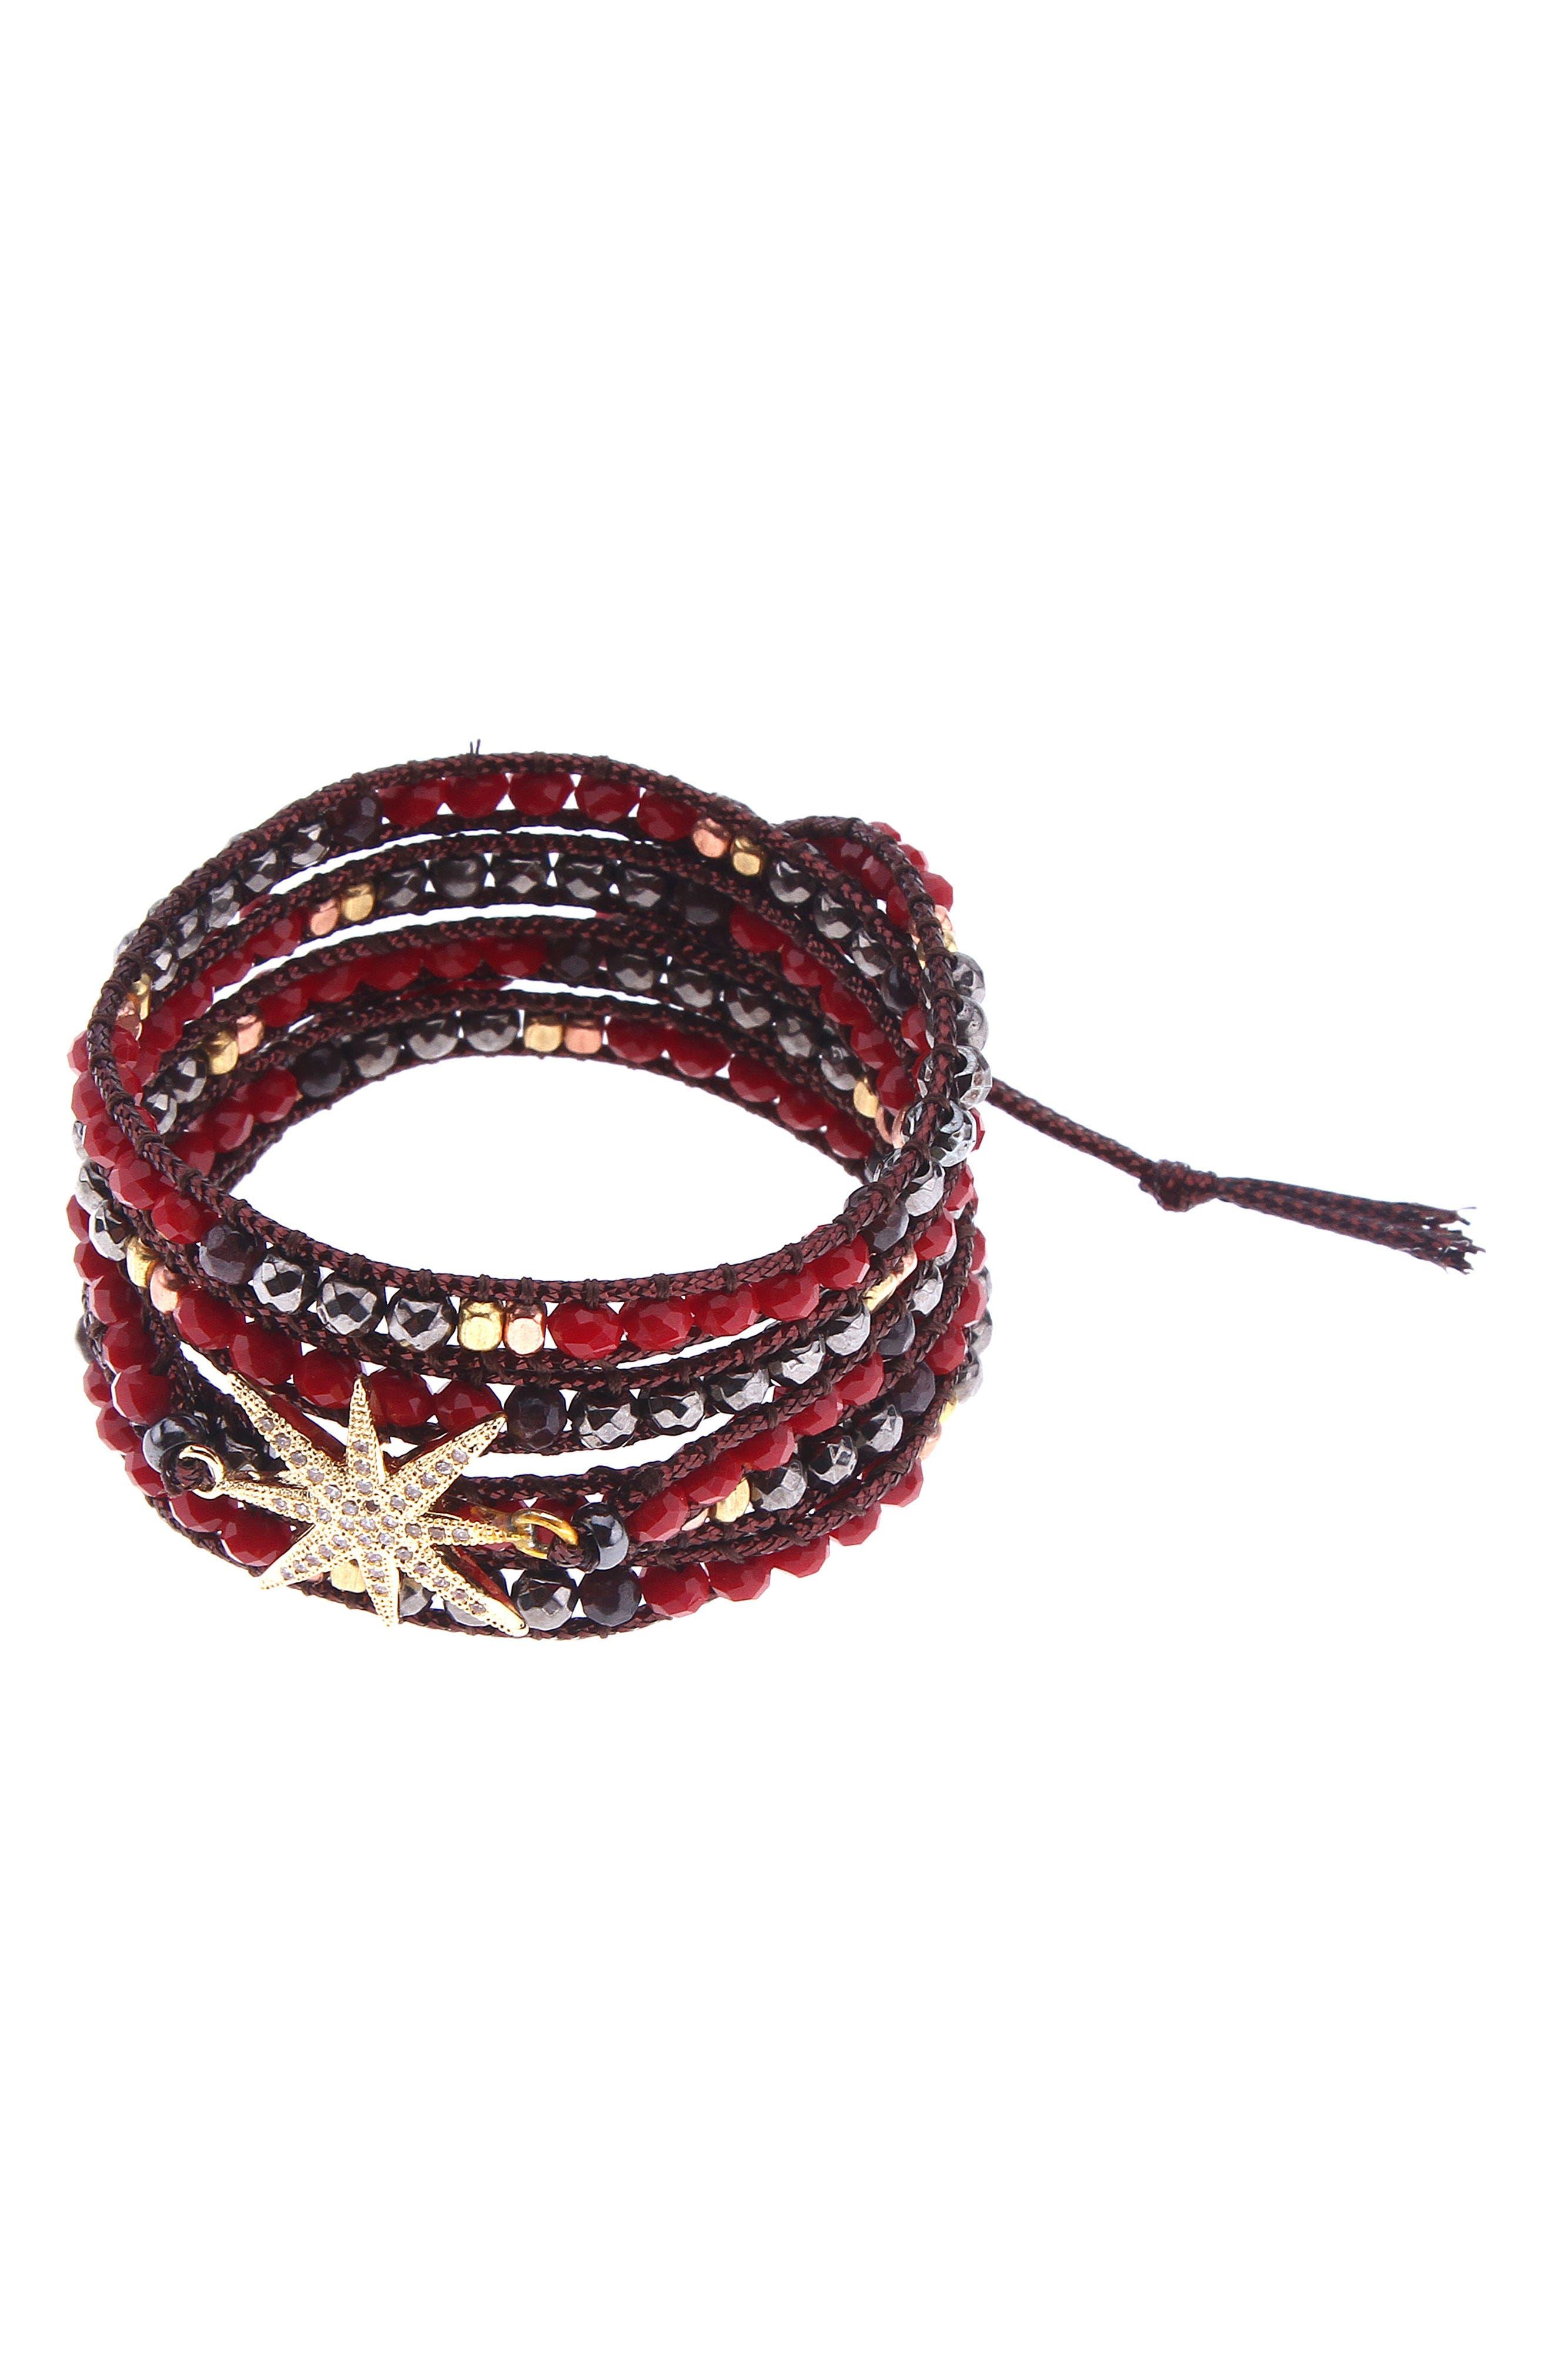 Nakamol Design Beaded Leather Wrap Bracelet